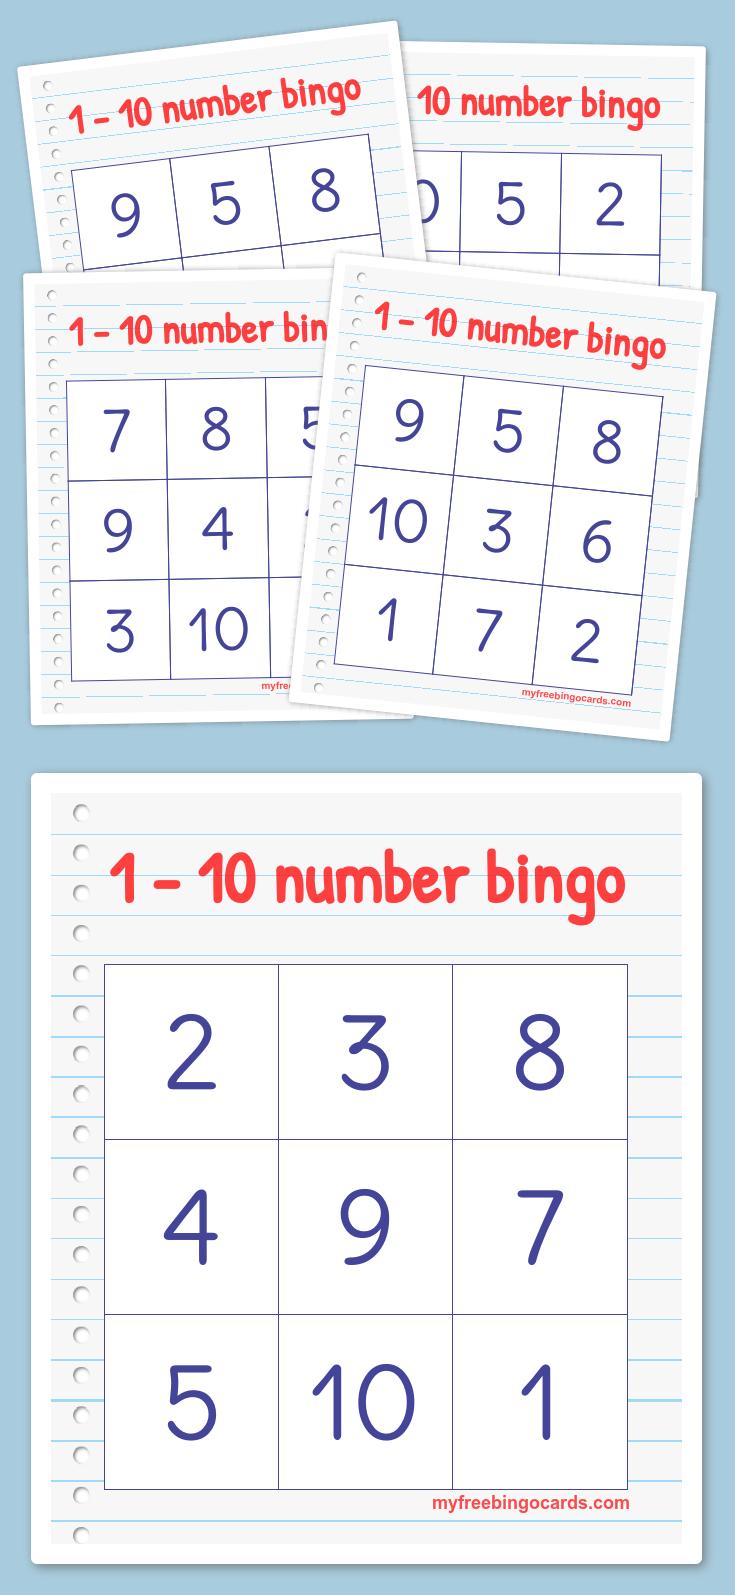 Free Printable Bingo Cards - Wiskunde Spelletjes